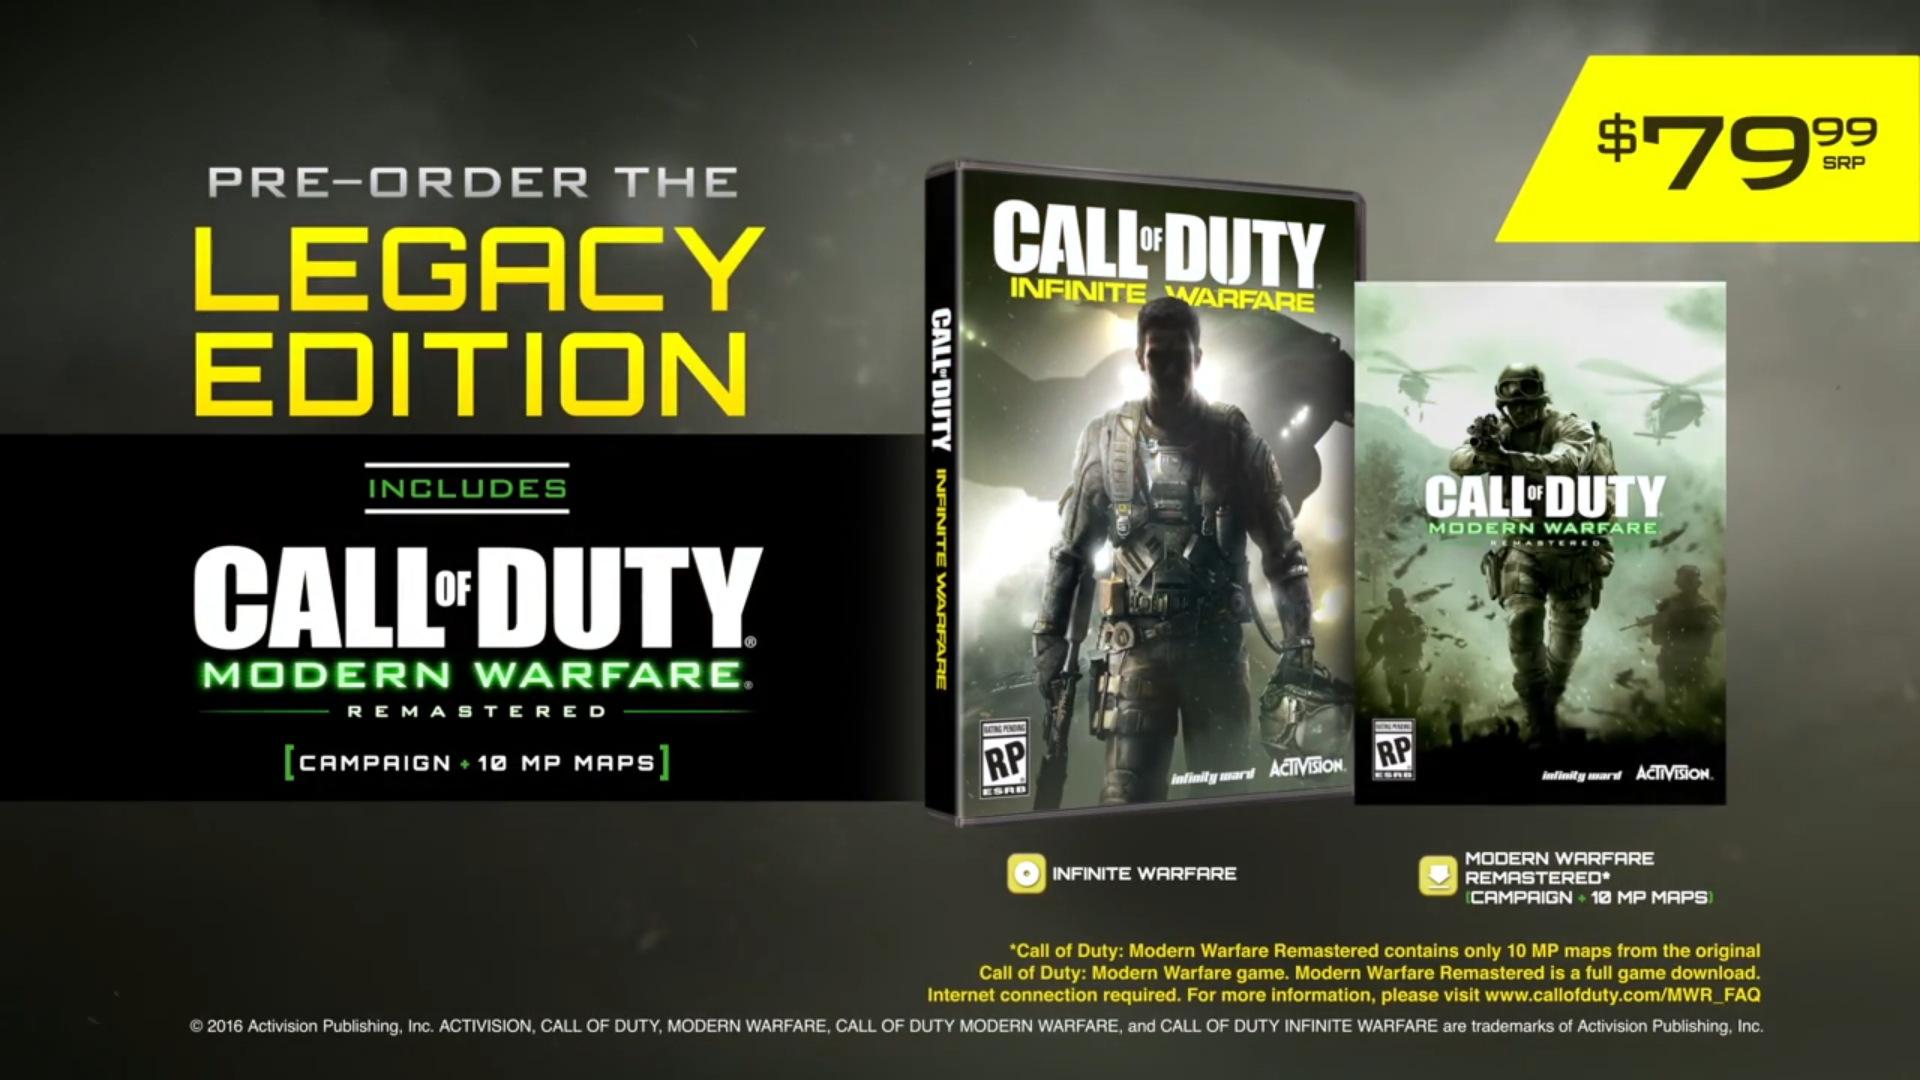 Call of Duty Infinte Warfare (3)